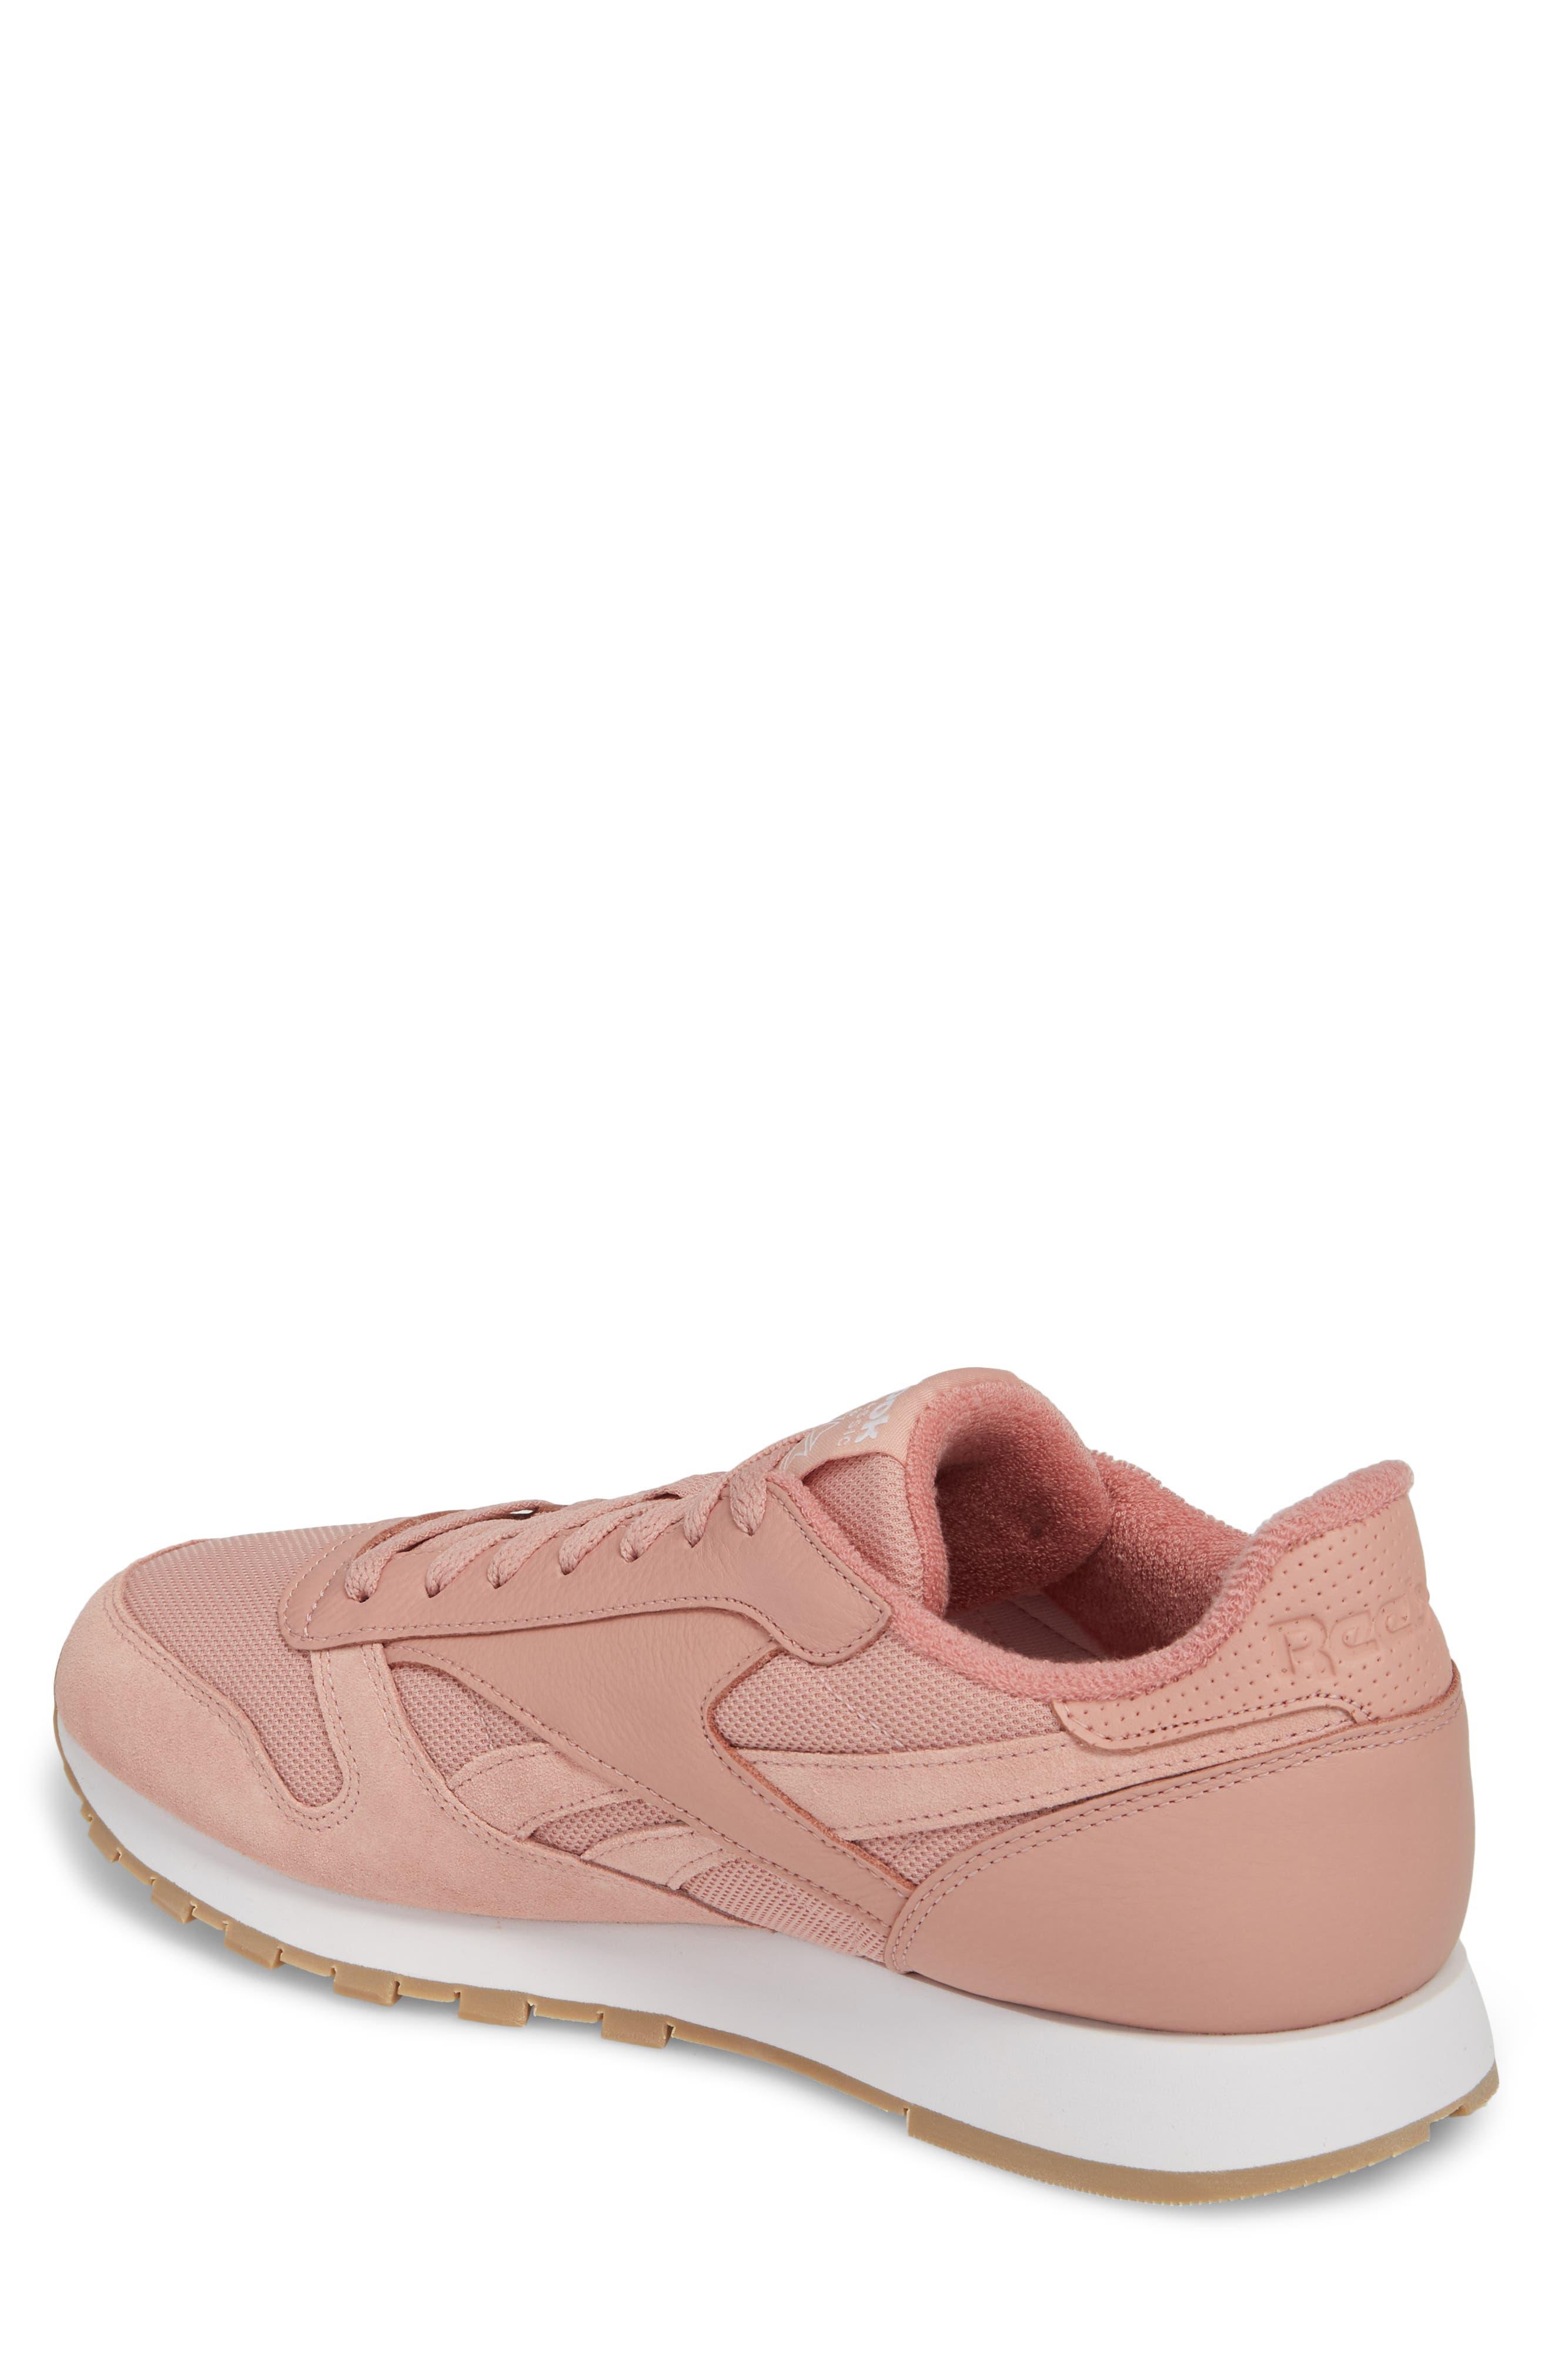 ESTL Classic Leather Sneaker,                             Alternate thumbnail 2, color,                             CHALK PINK/ WHITE